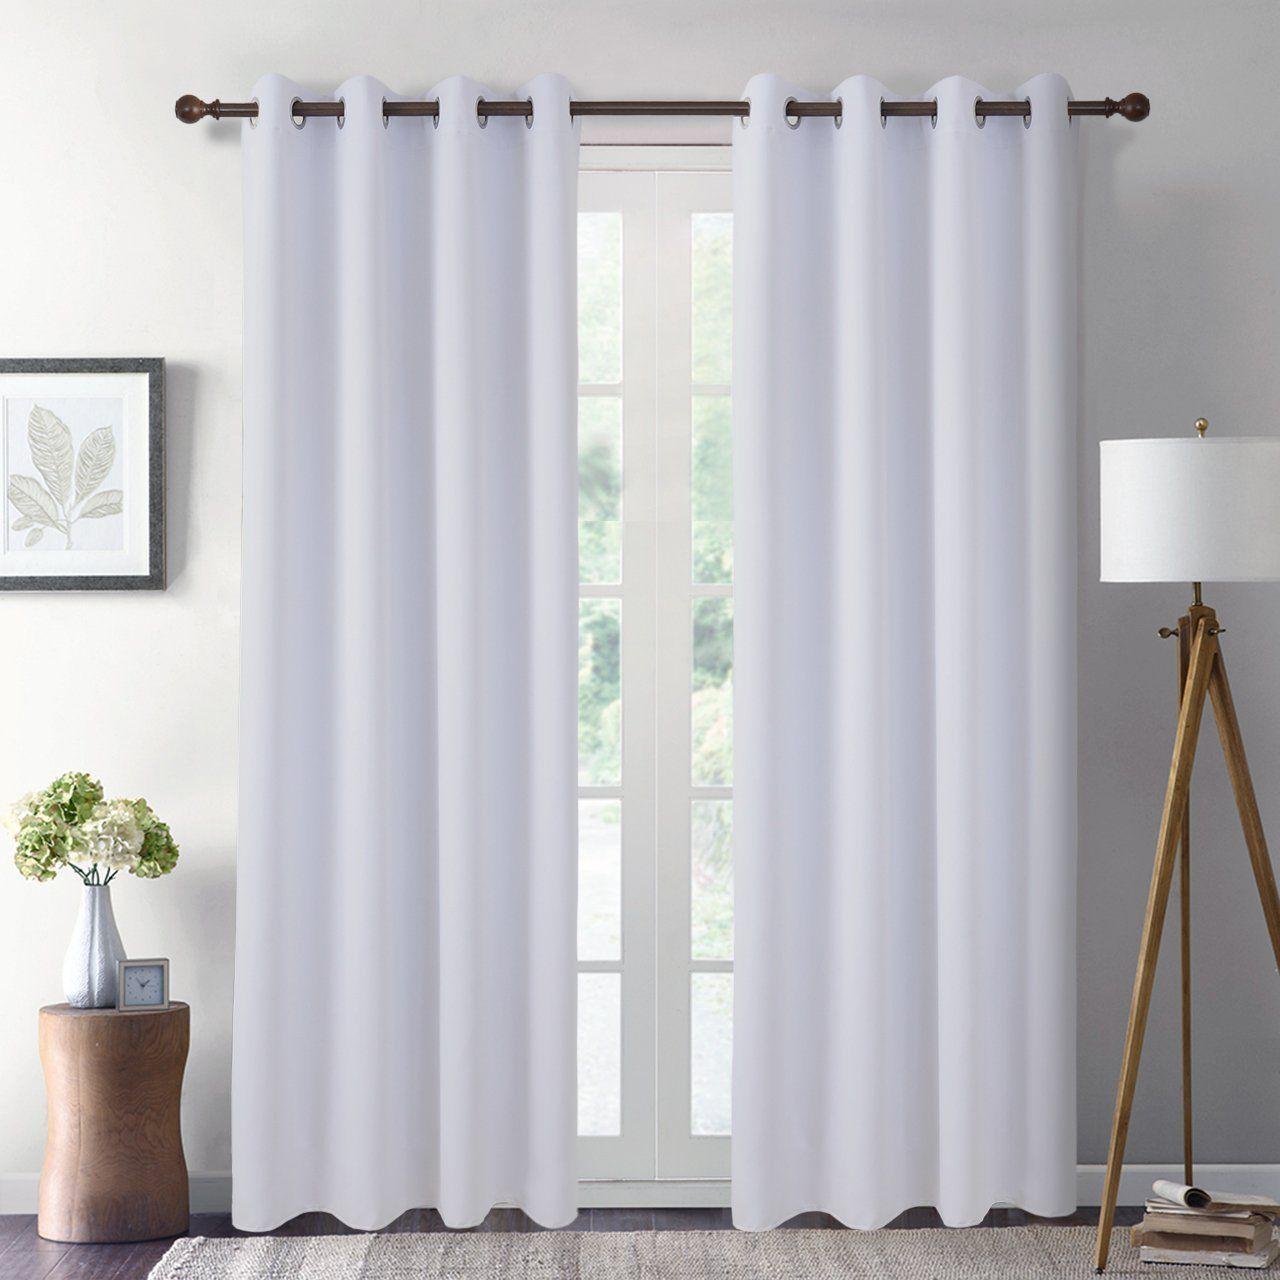 Amazon Com Giaerd 2 Panel Set Blackout Window Panel Curtains